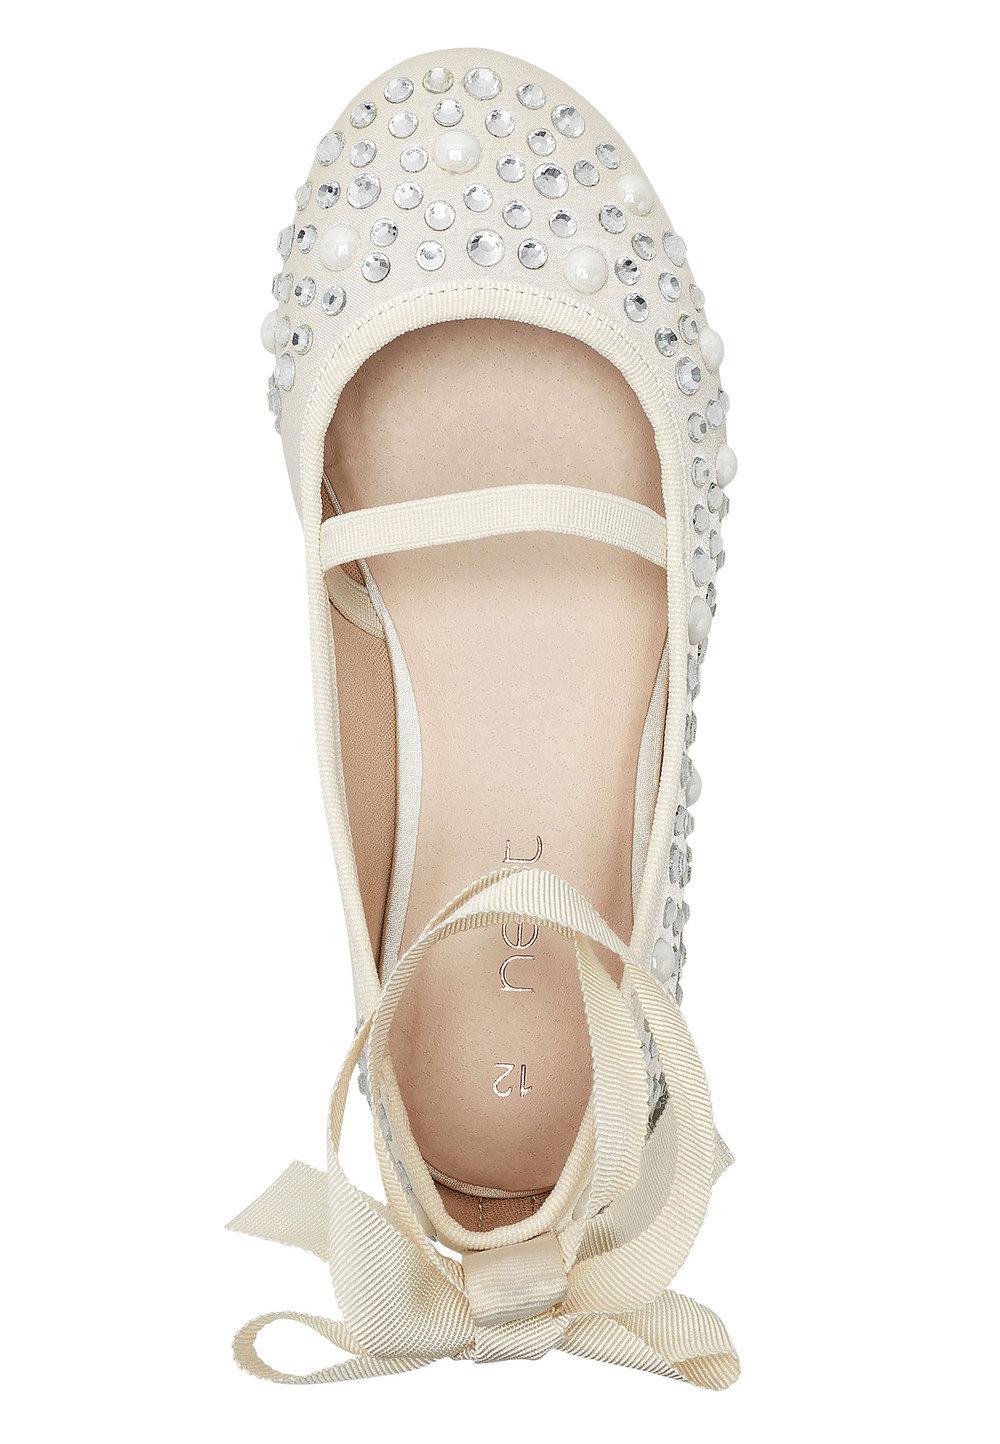 03eea7da362 Next Pearl Effect Ballet Shoes (Older Girls) Online